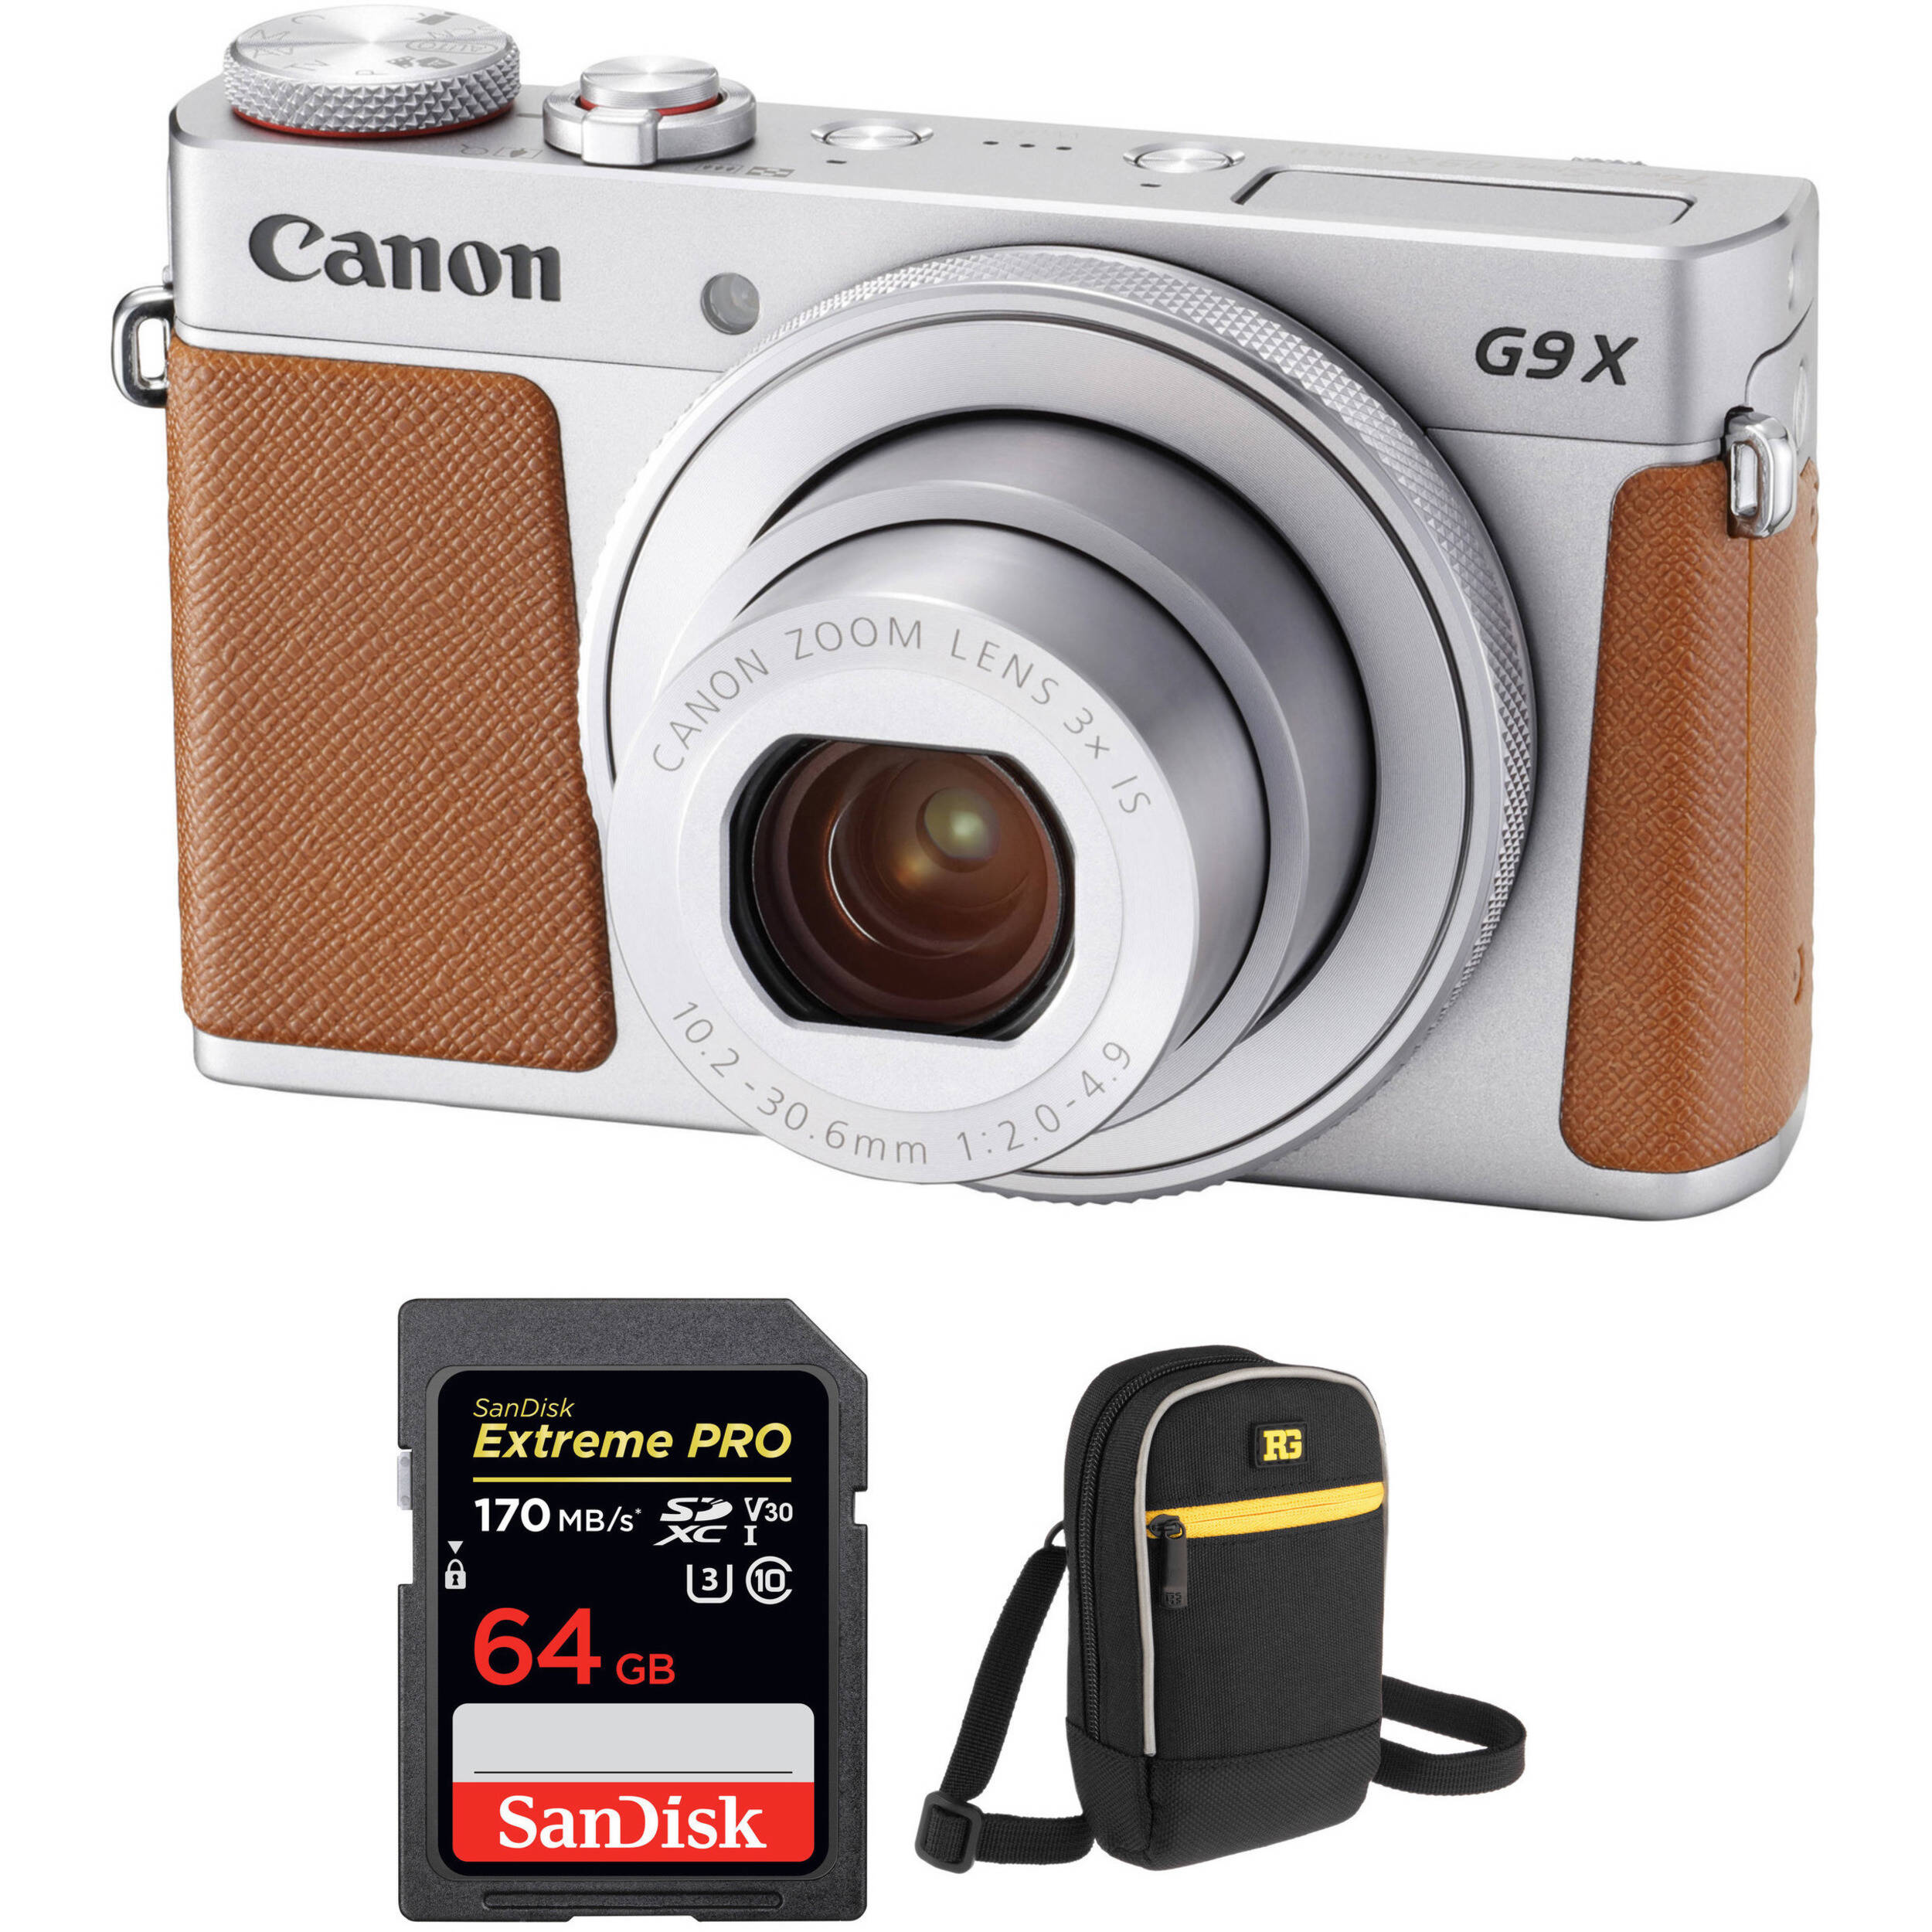 canon powershot g9 x mark ii digital camera with free accessory rh bhphotovideo com Canon PowerShot G9 Accessories canon powershot g9 service manual